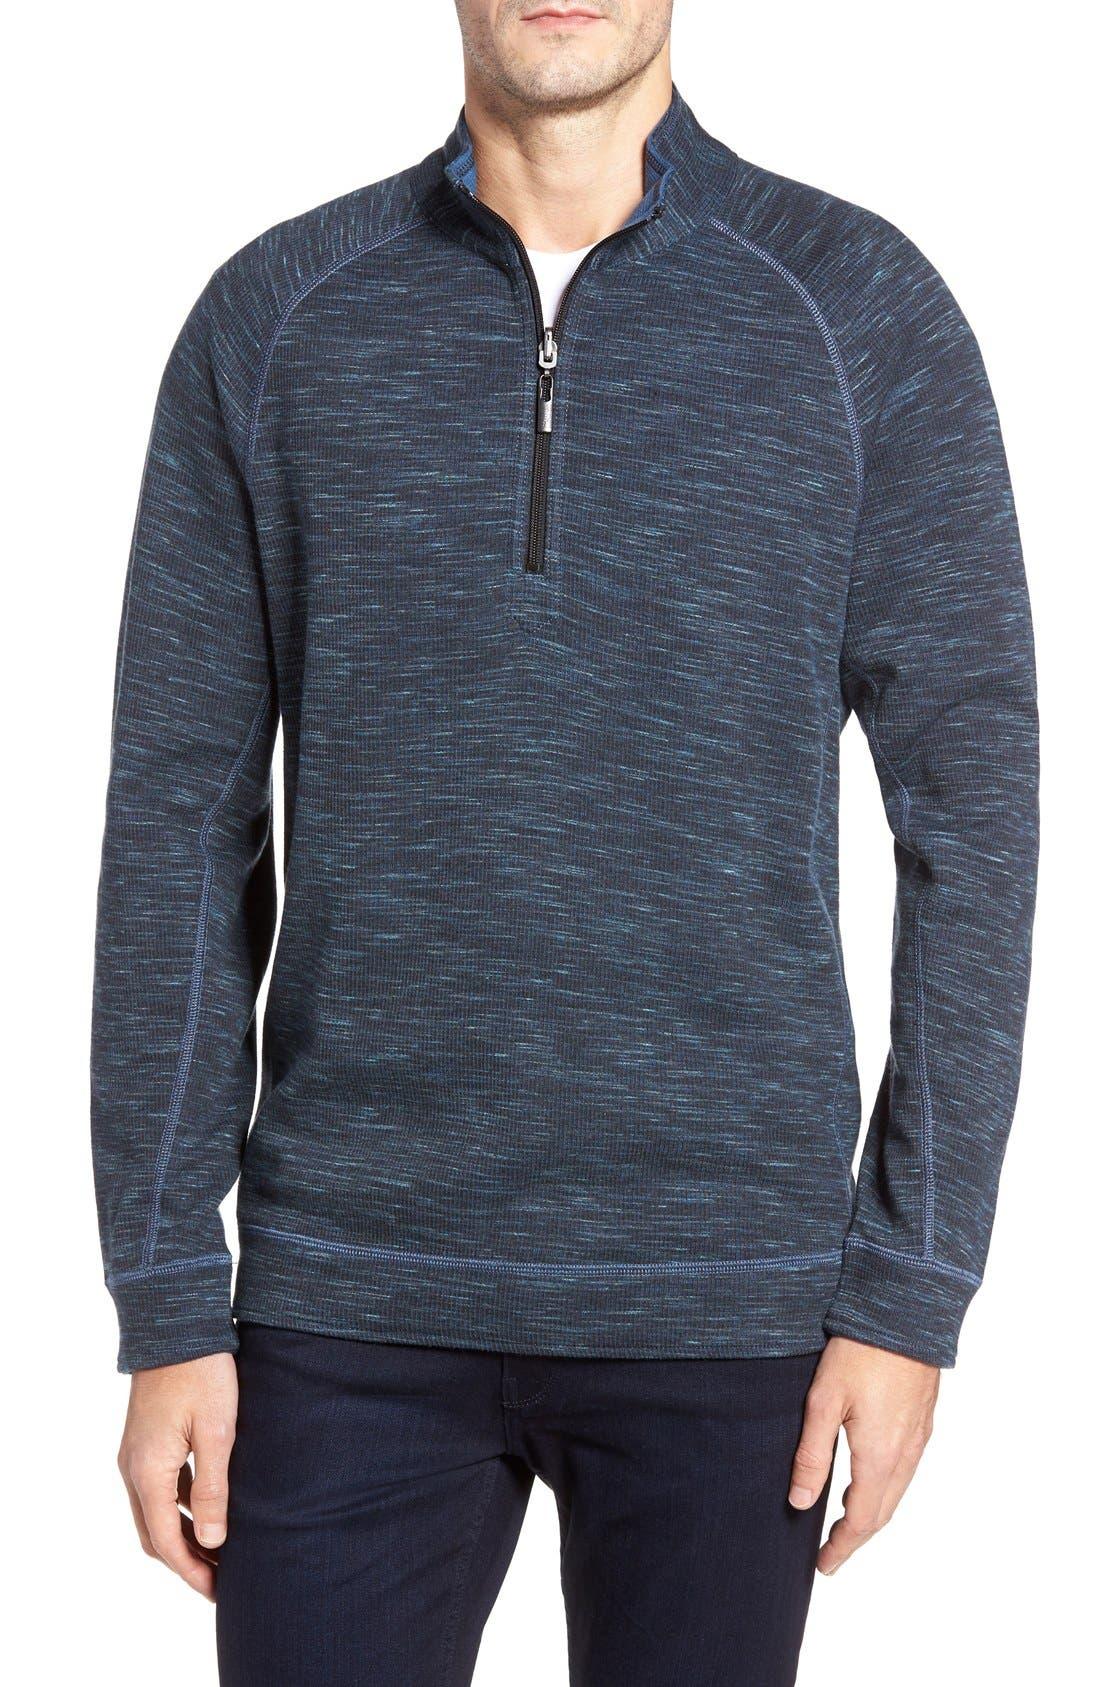 Slubtropics Reversible Half Zip Pullover,                         Main,                         color, Jet Black Heather